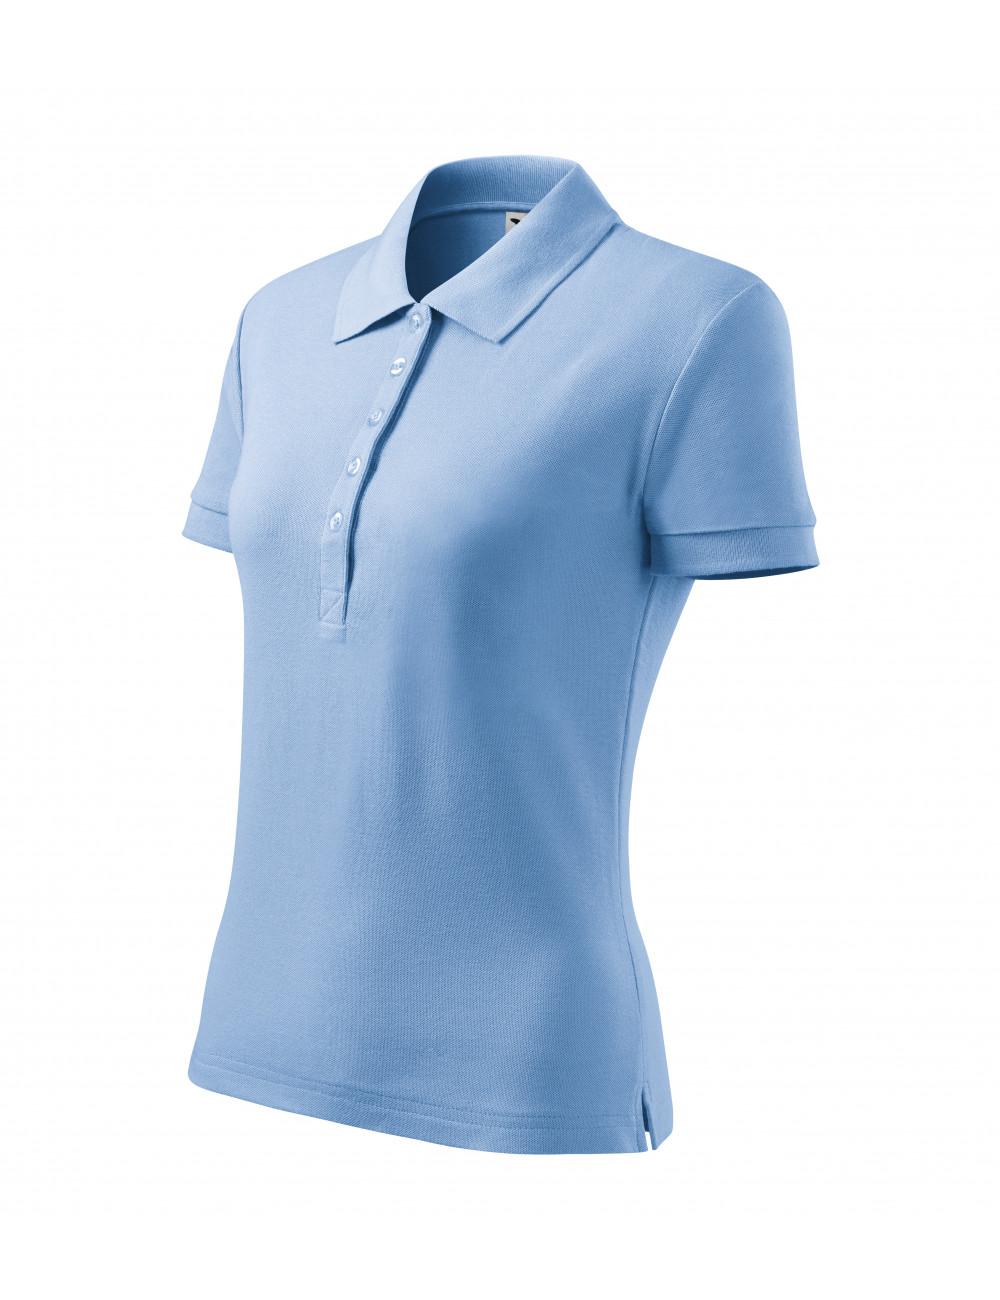 Adler MALFINI Koszulka polo damska Cotton Heavy 216 błękitny